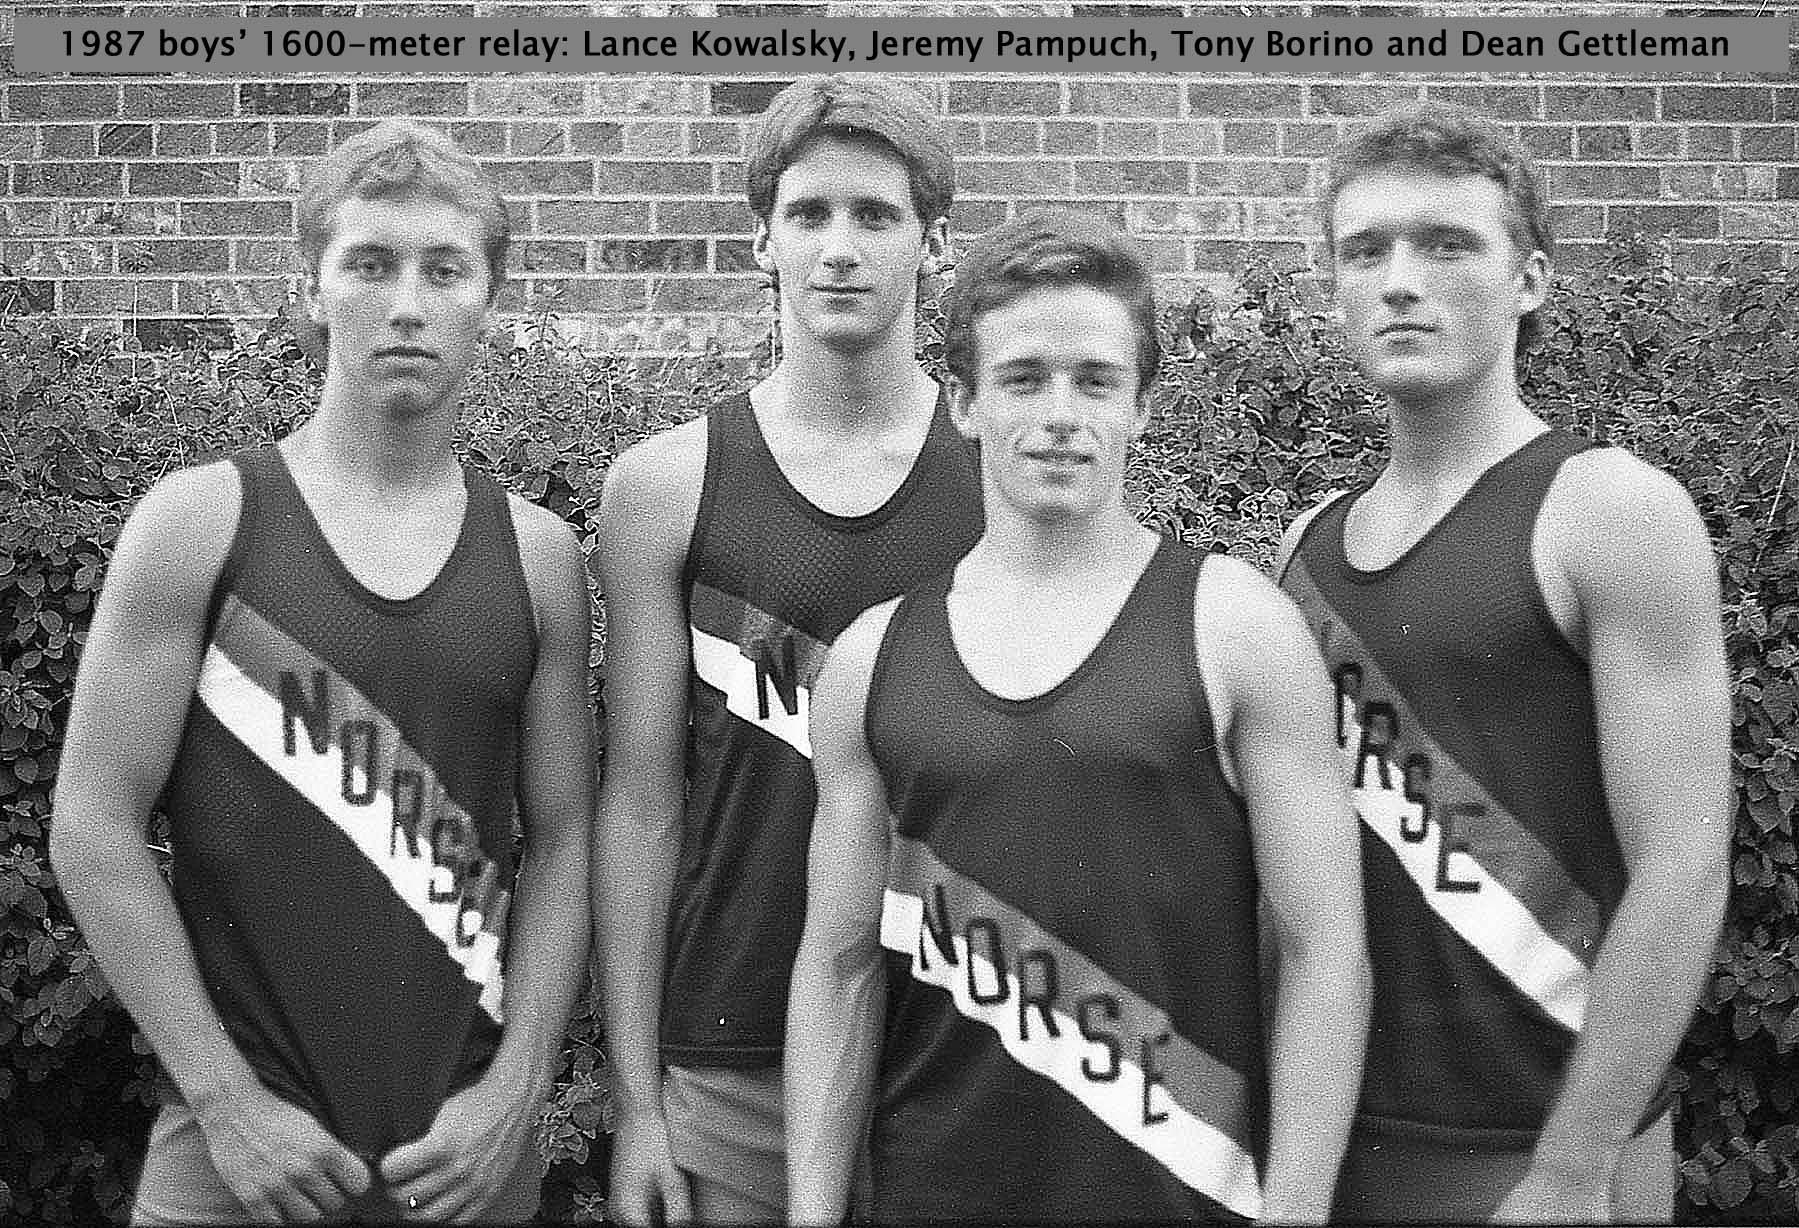 1987 4x4 relay team 1.jpg